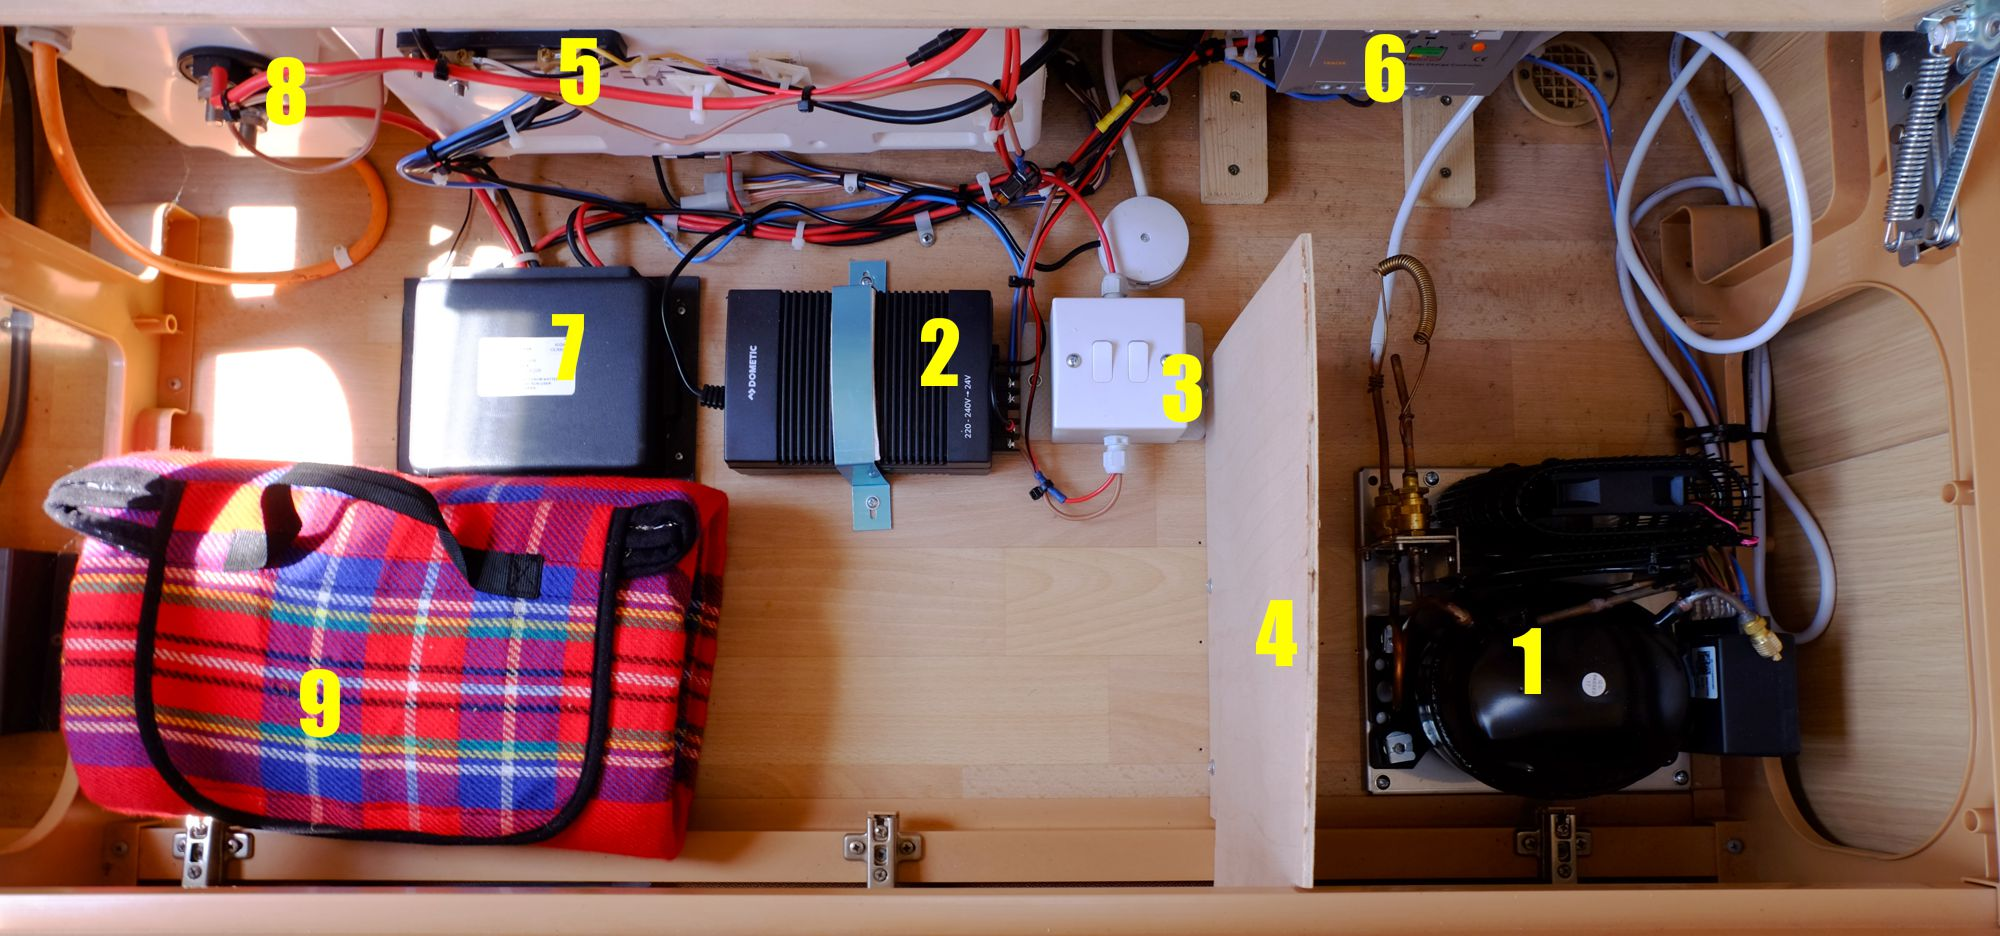 Full installation under the seat (key below)